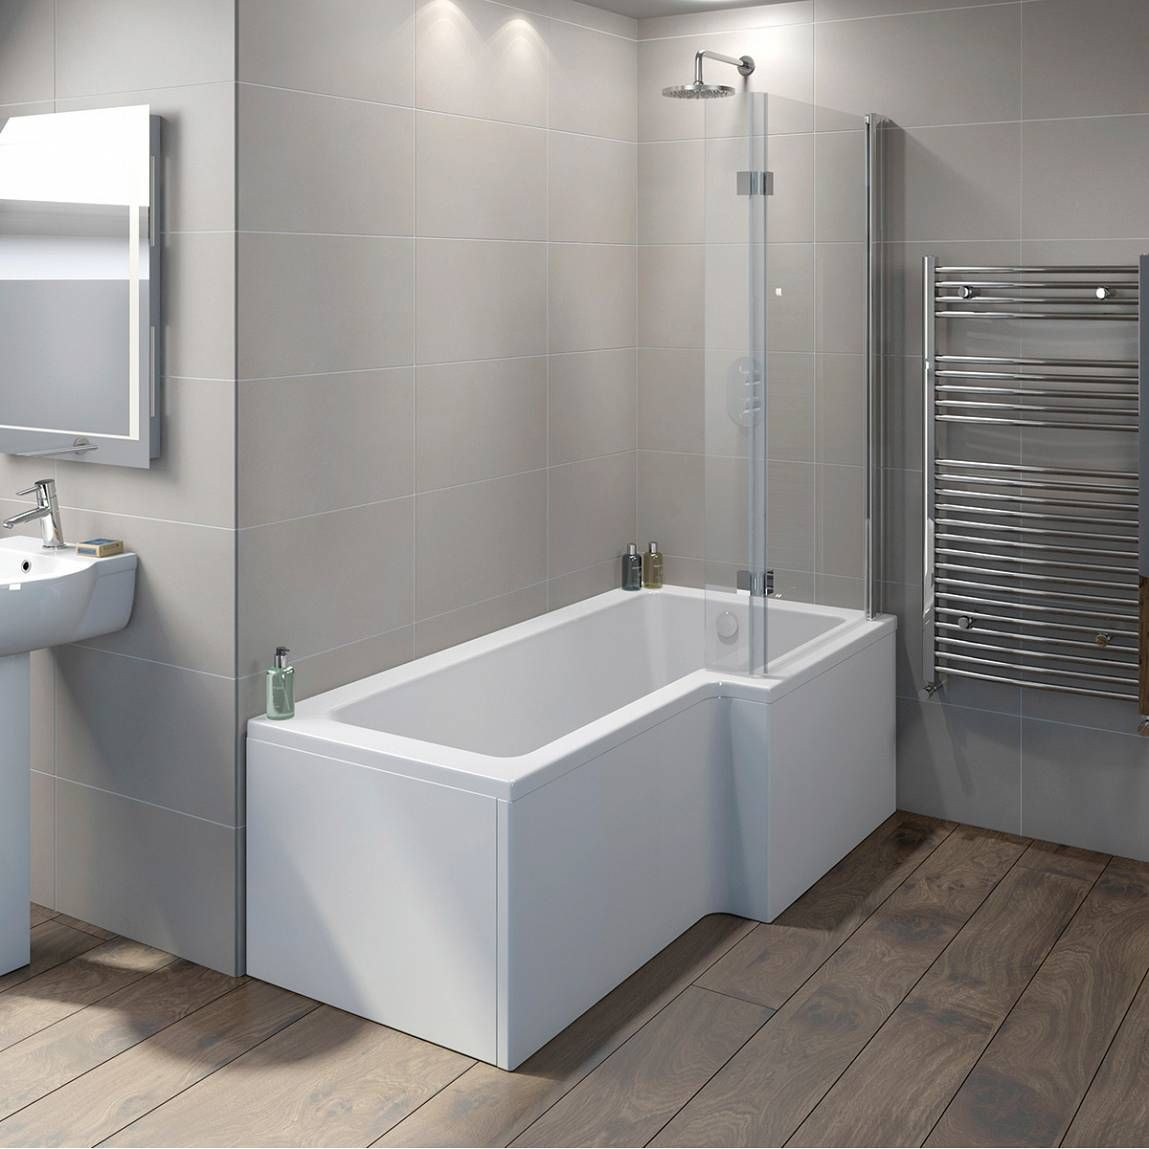 Boston Shower Bath 1500 X 850 RH With 8mm Hinged Screen